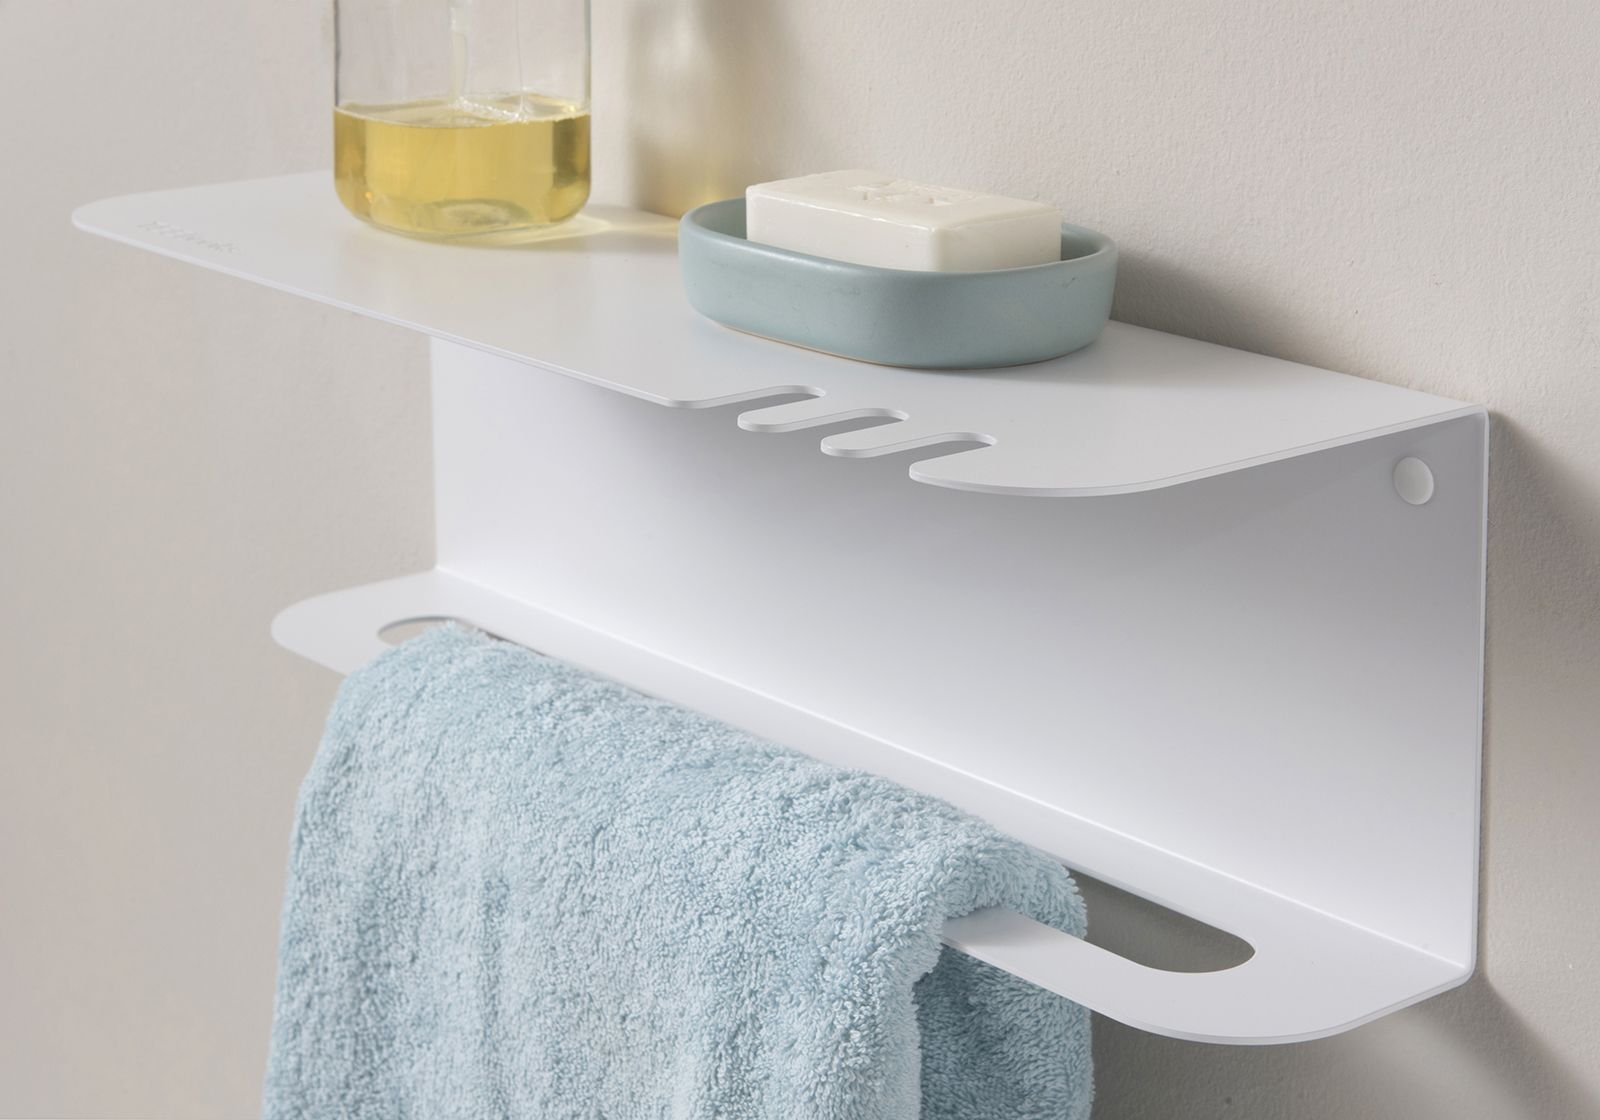 Porta asciugamani teetow 45 cm - Amazon porta asciugamani bagno ...